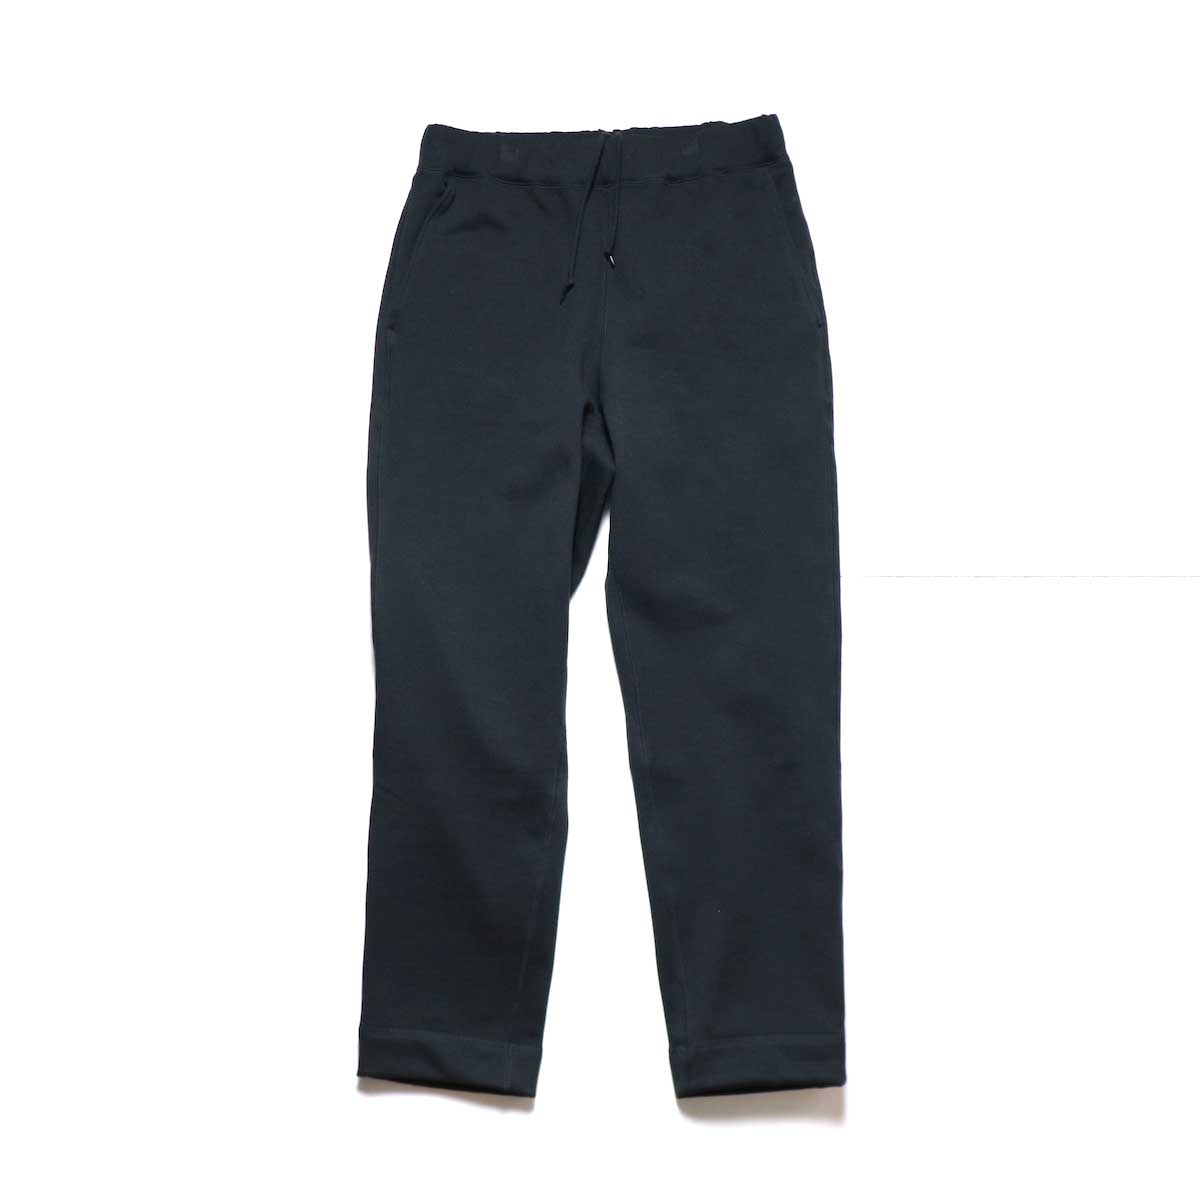 N.HOOLYWOOD / 27RCH-013 Track Pants (Black)正面